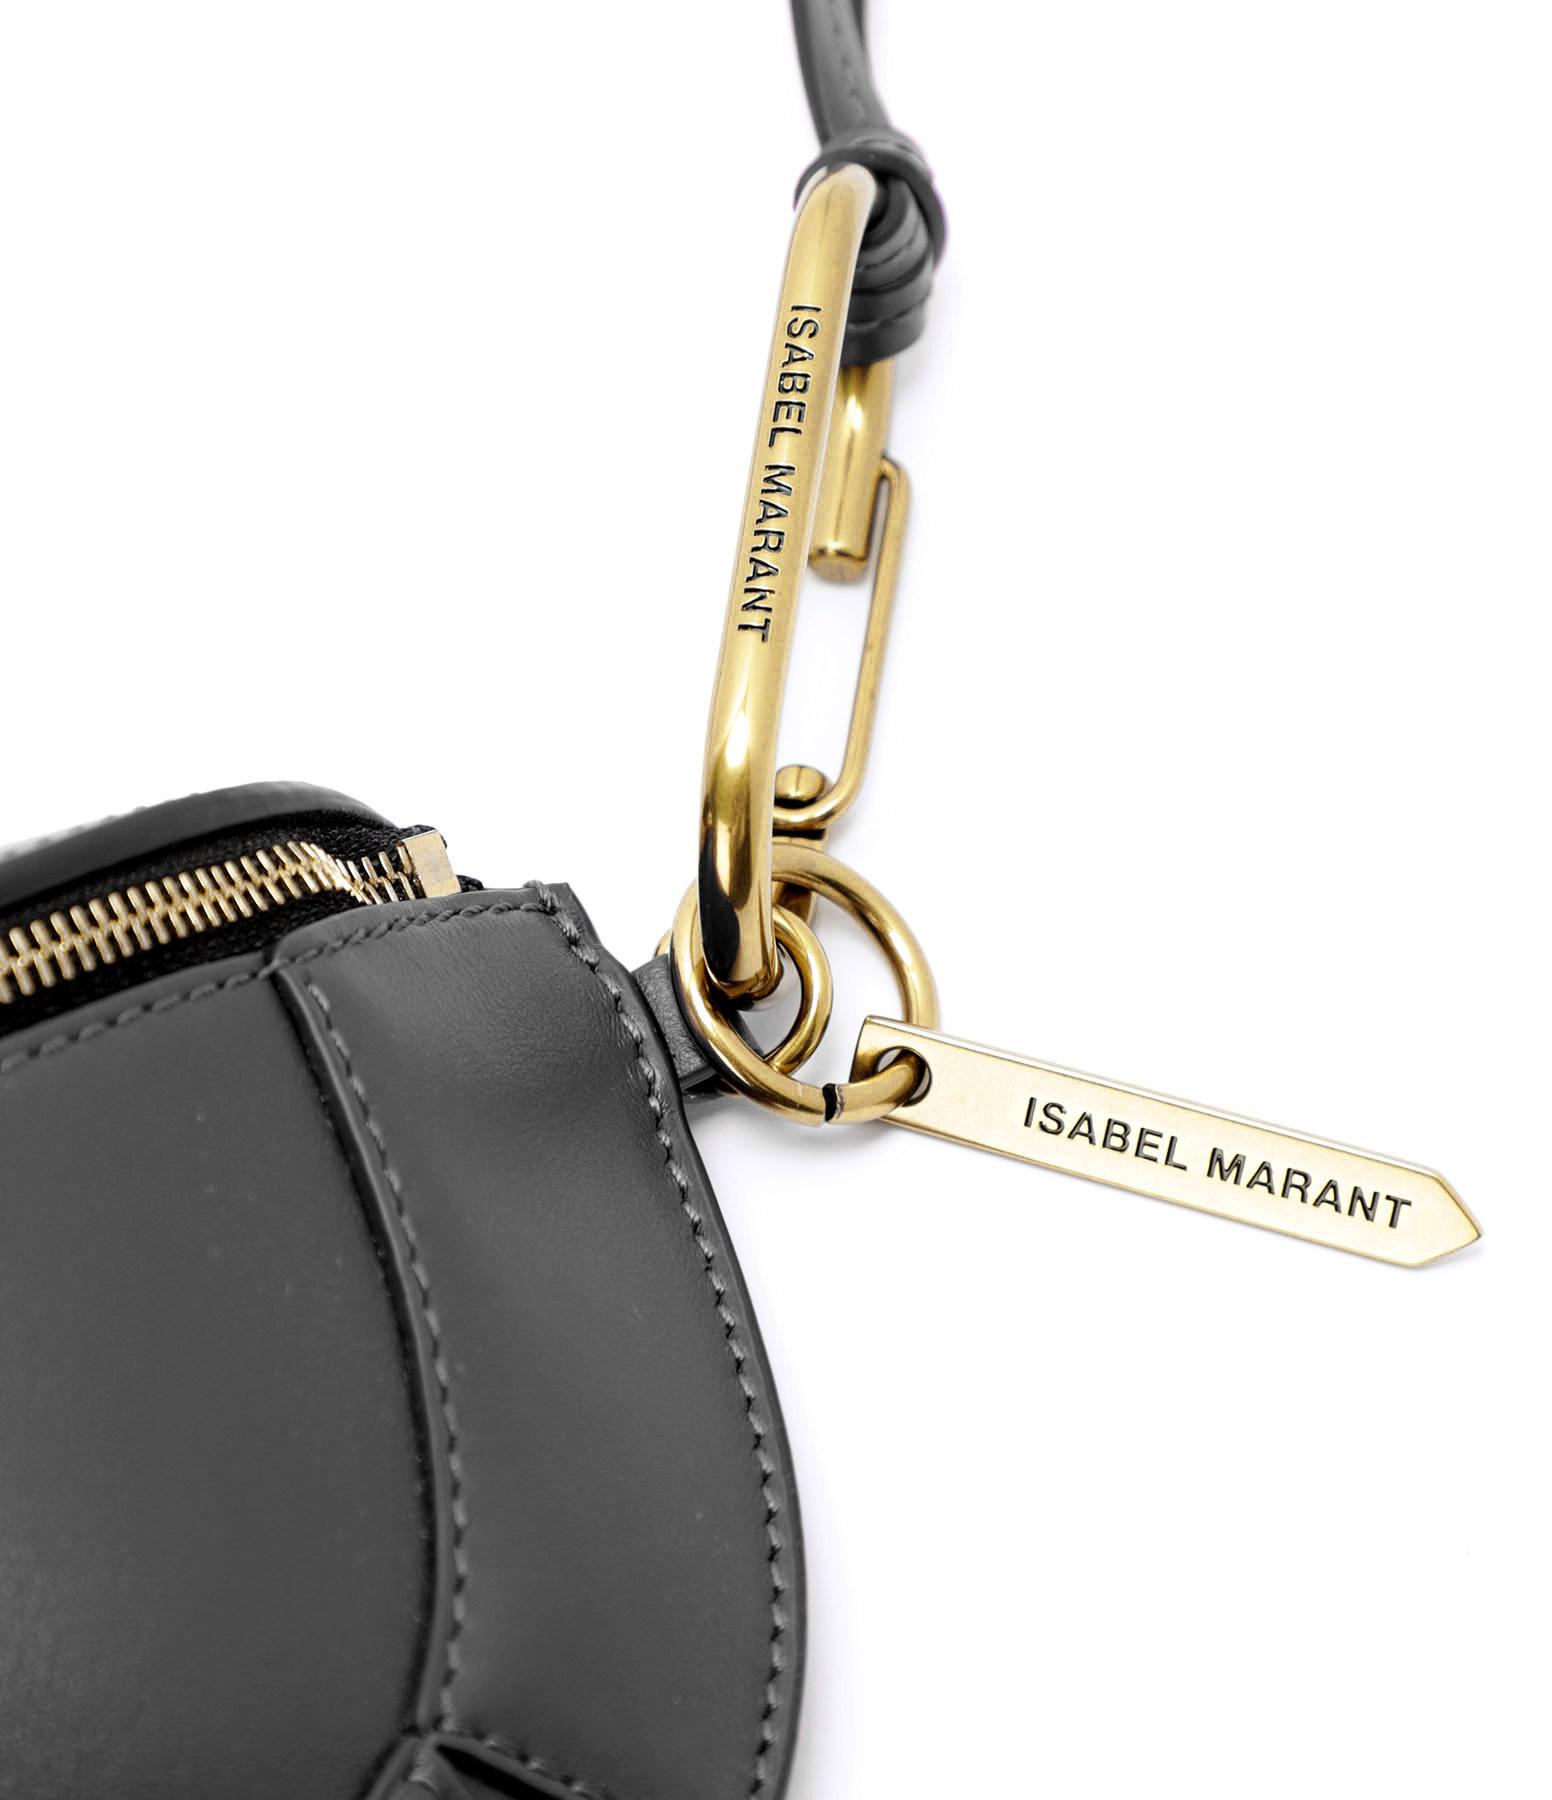 ISABEL MARANT - Pochette Bossey Cuir Noir